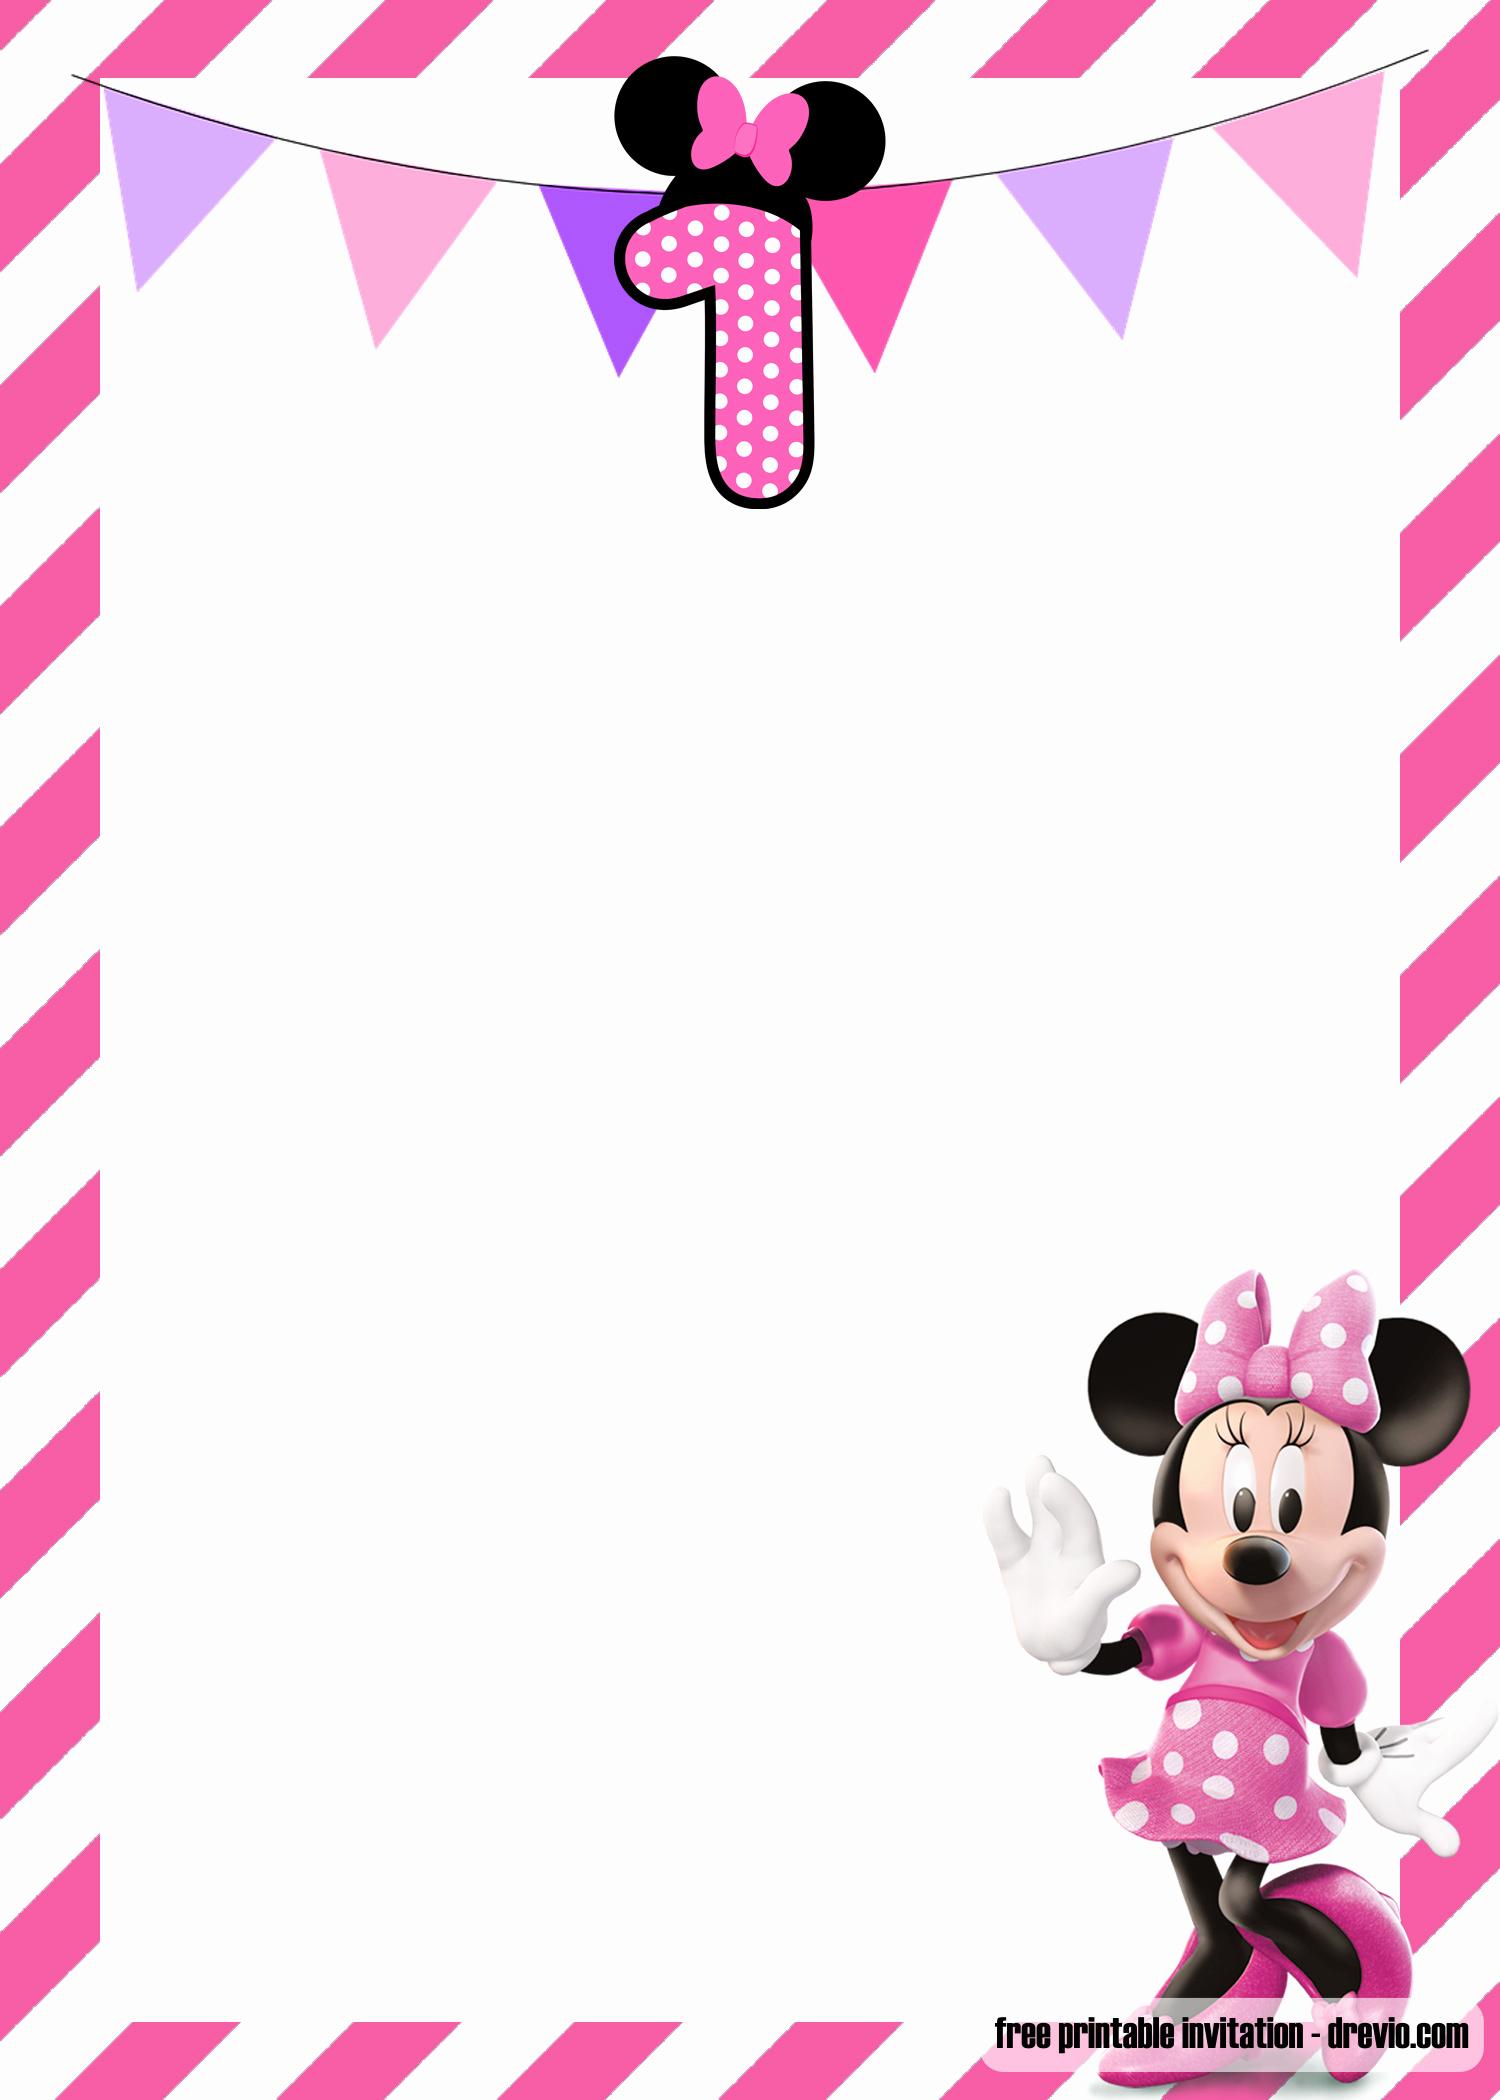 Minnie Mouse Invitation Template Free Elegant Free Minnie Mouse 1st Birthday Invitations Templates